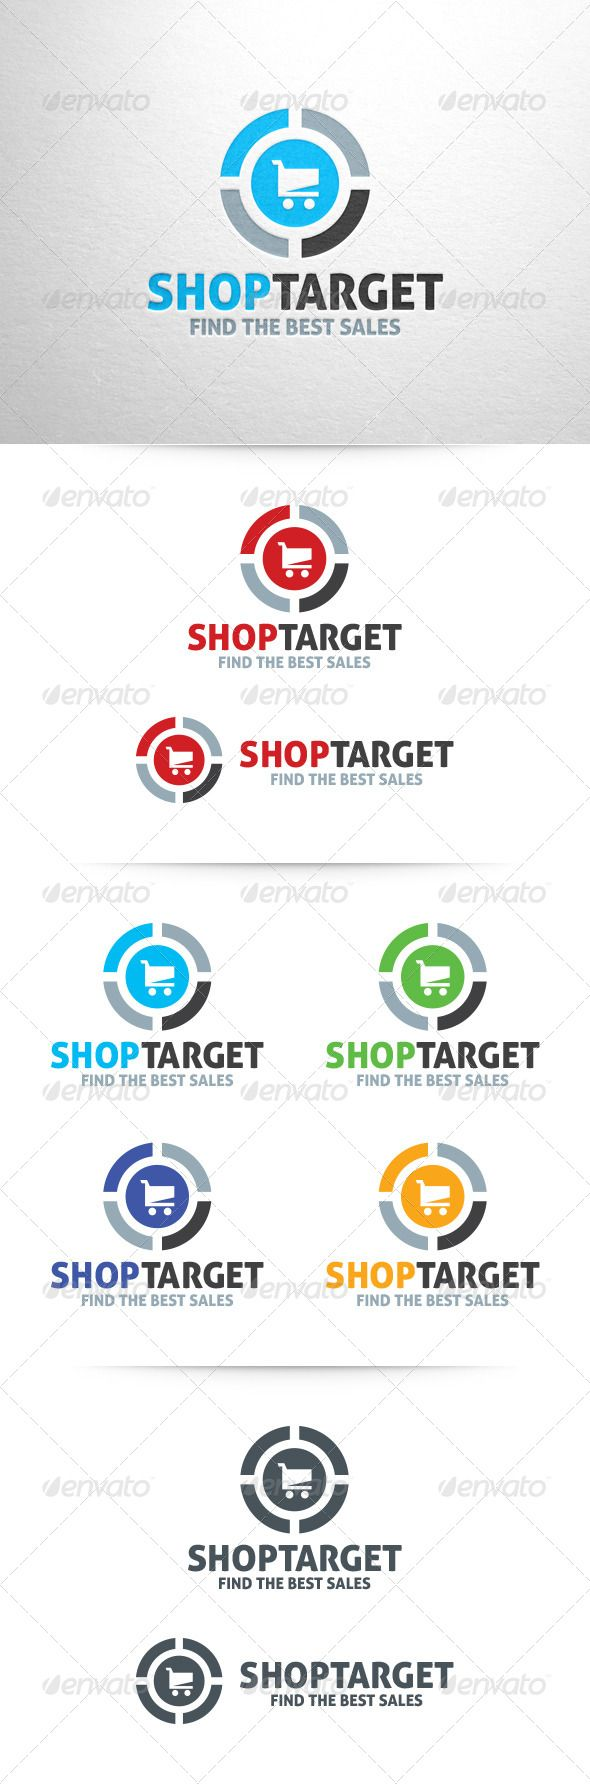 Shop Target Logo Template Logo Templates Logos And Design Layouts - Logo layout templates